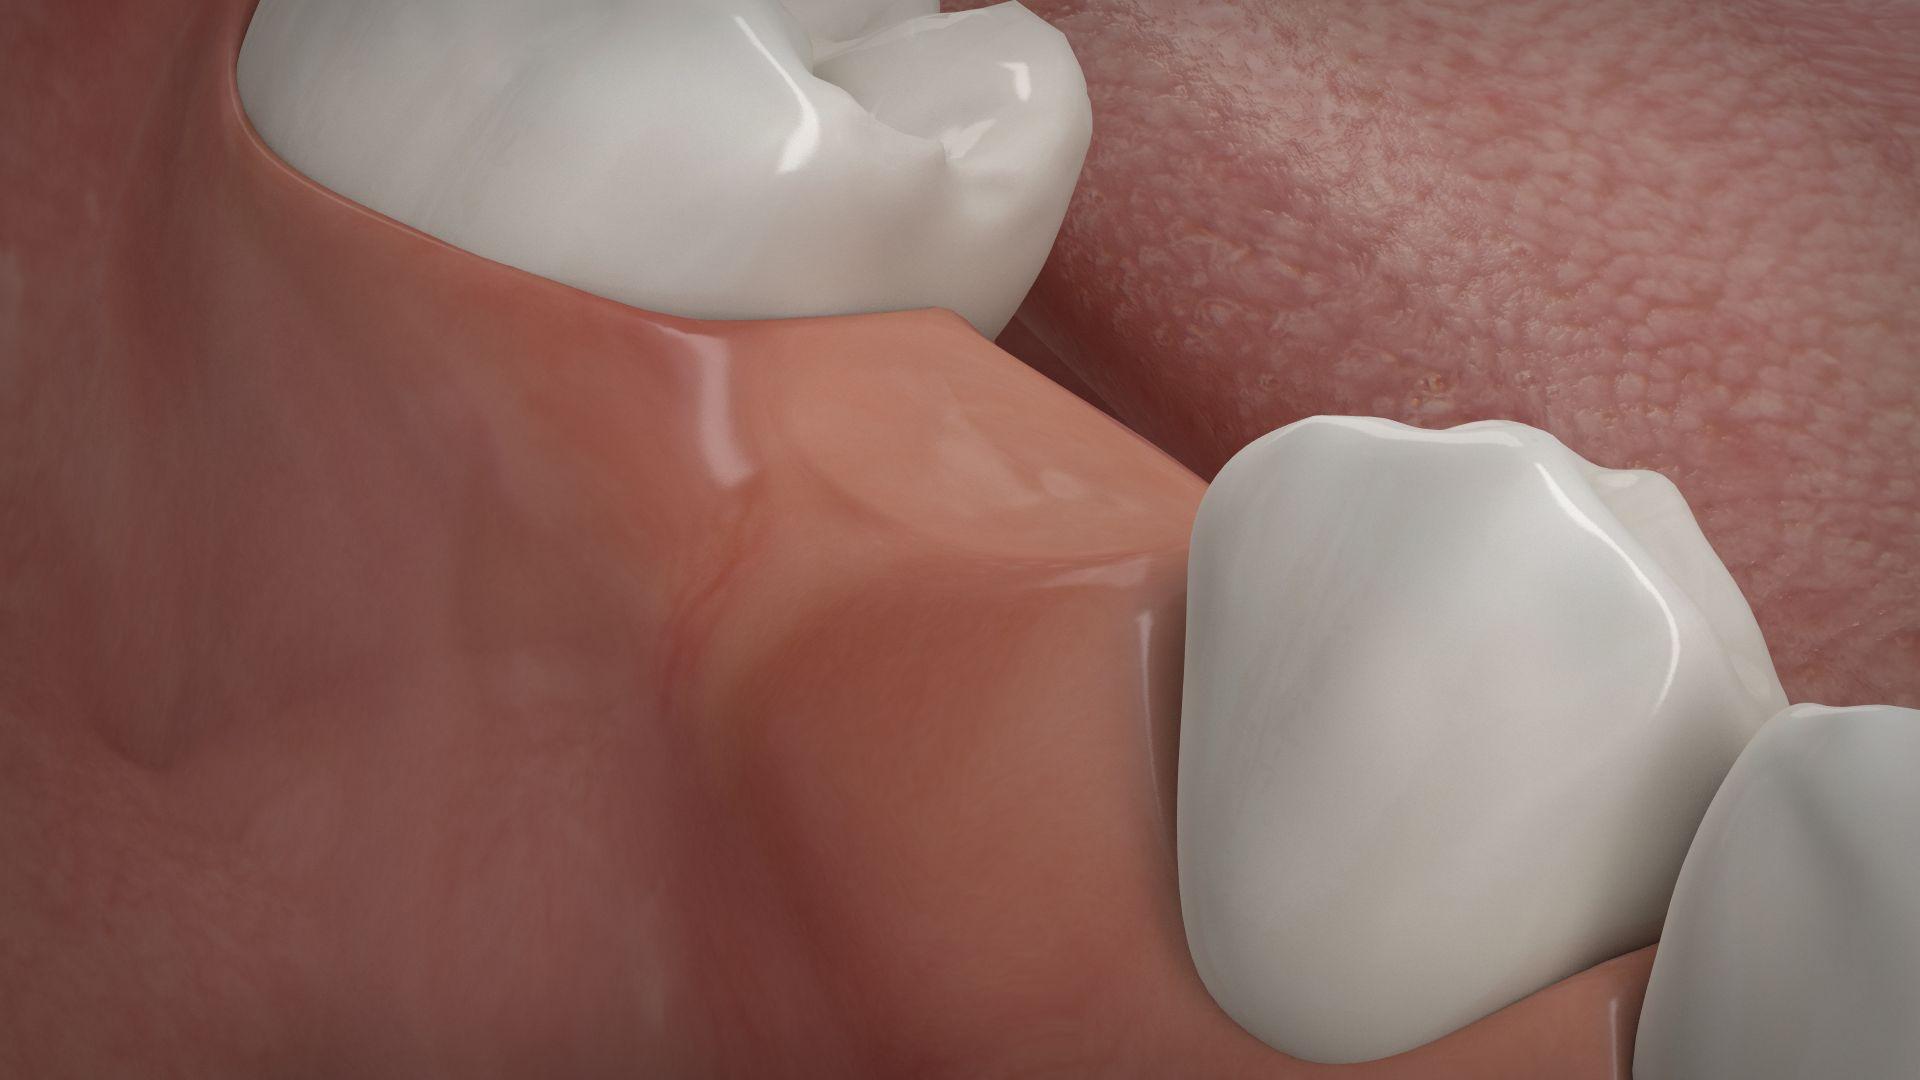 Knochenaufbau Rückbildung, Zahnarzt Düsseldorf, Dr. Tabatabaie & Kollegen